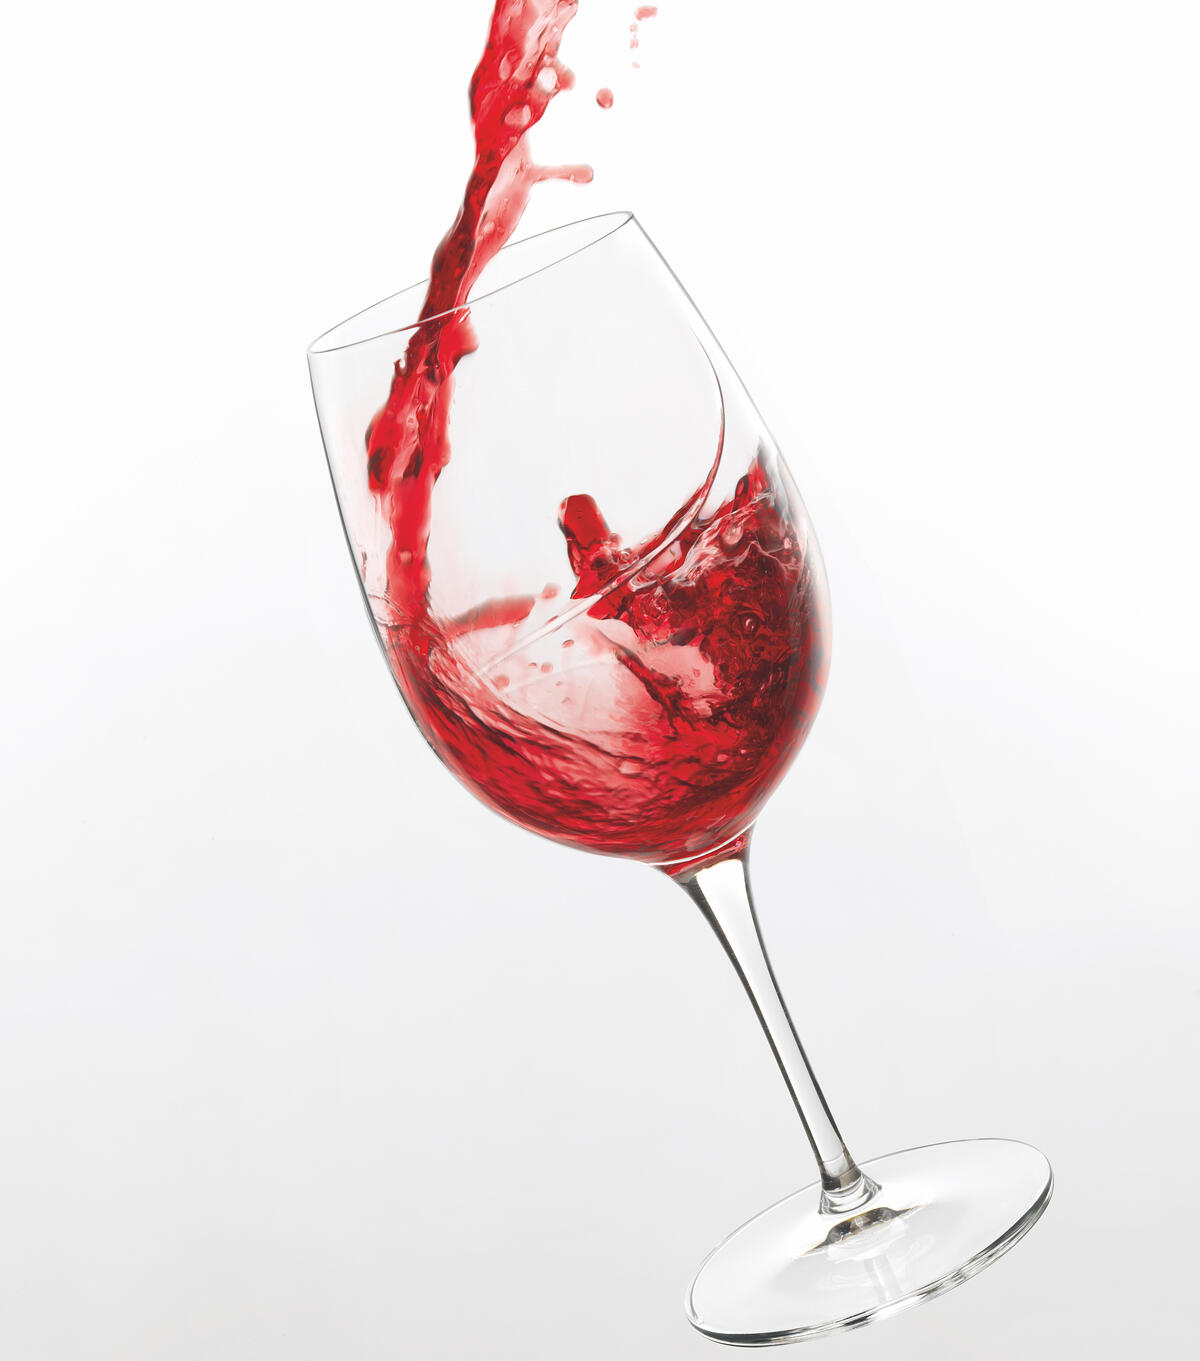 How Luigi Bormioli's Aero Collection Can Improve Wine Tasting